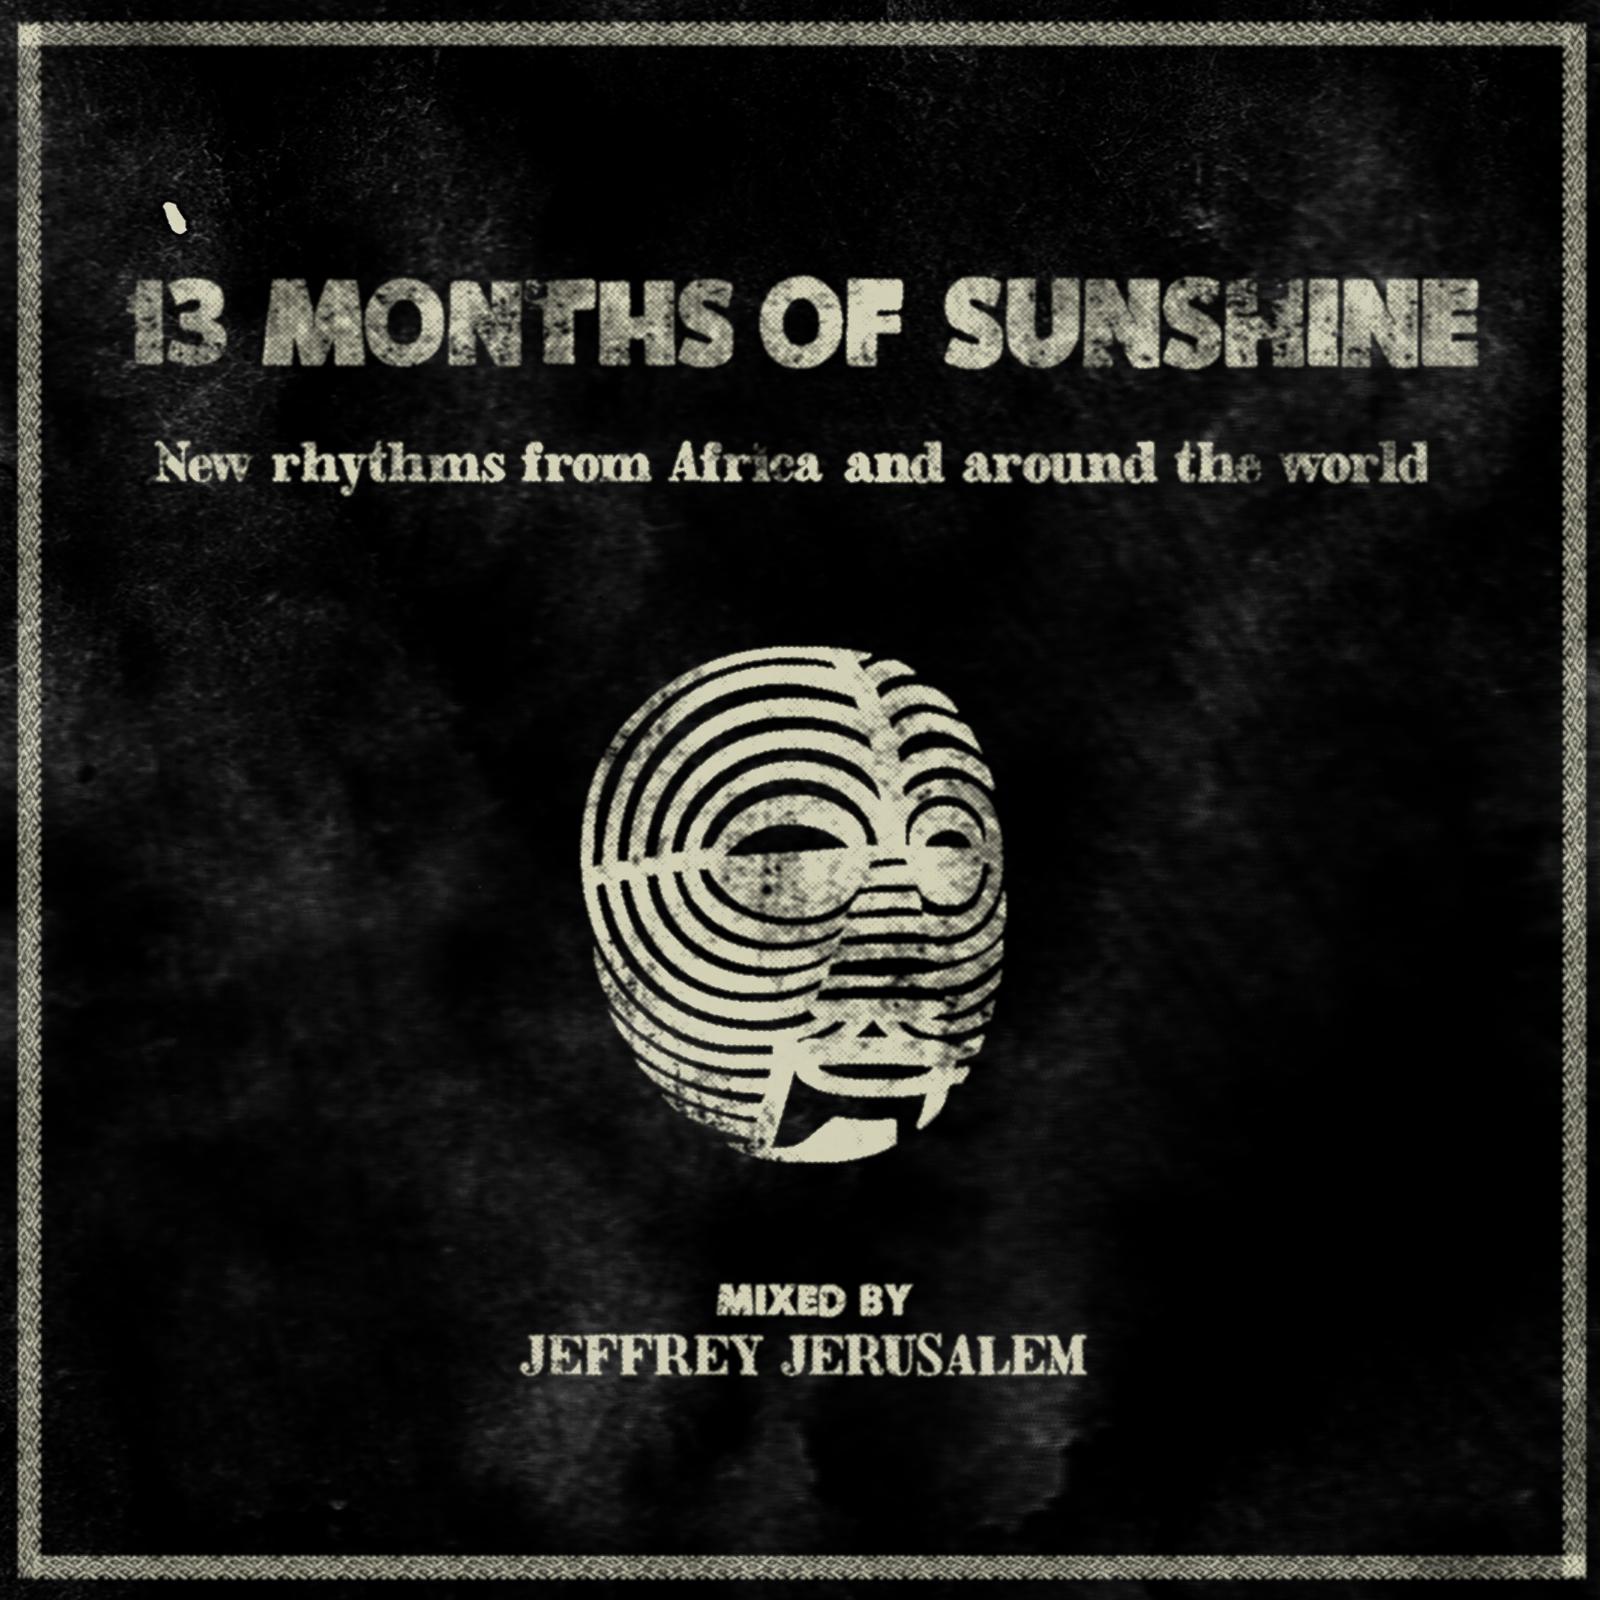 13 months of sunshine.jpg